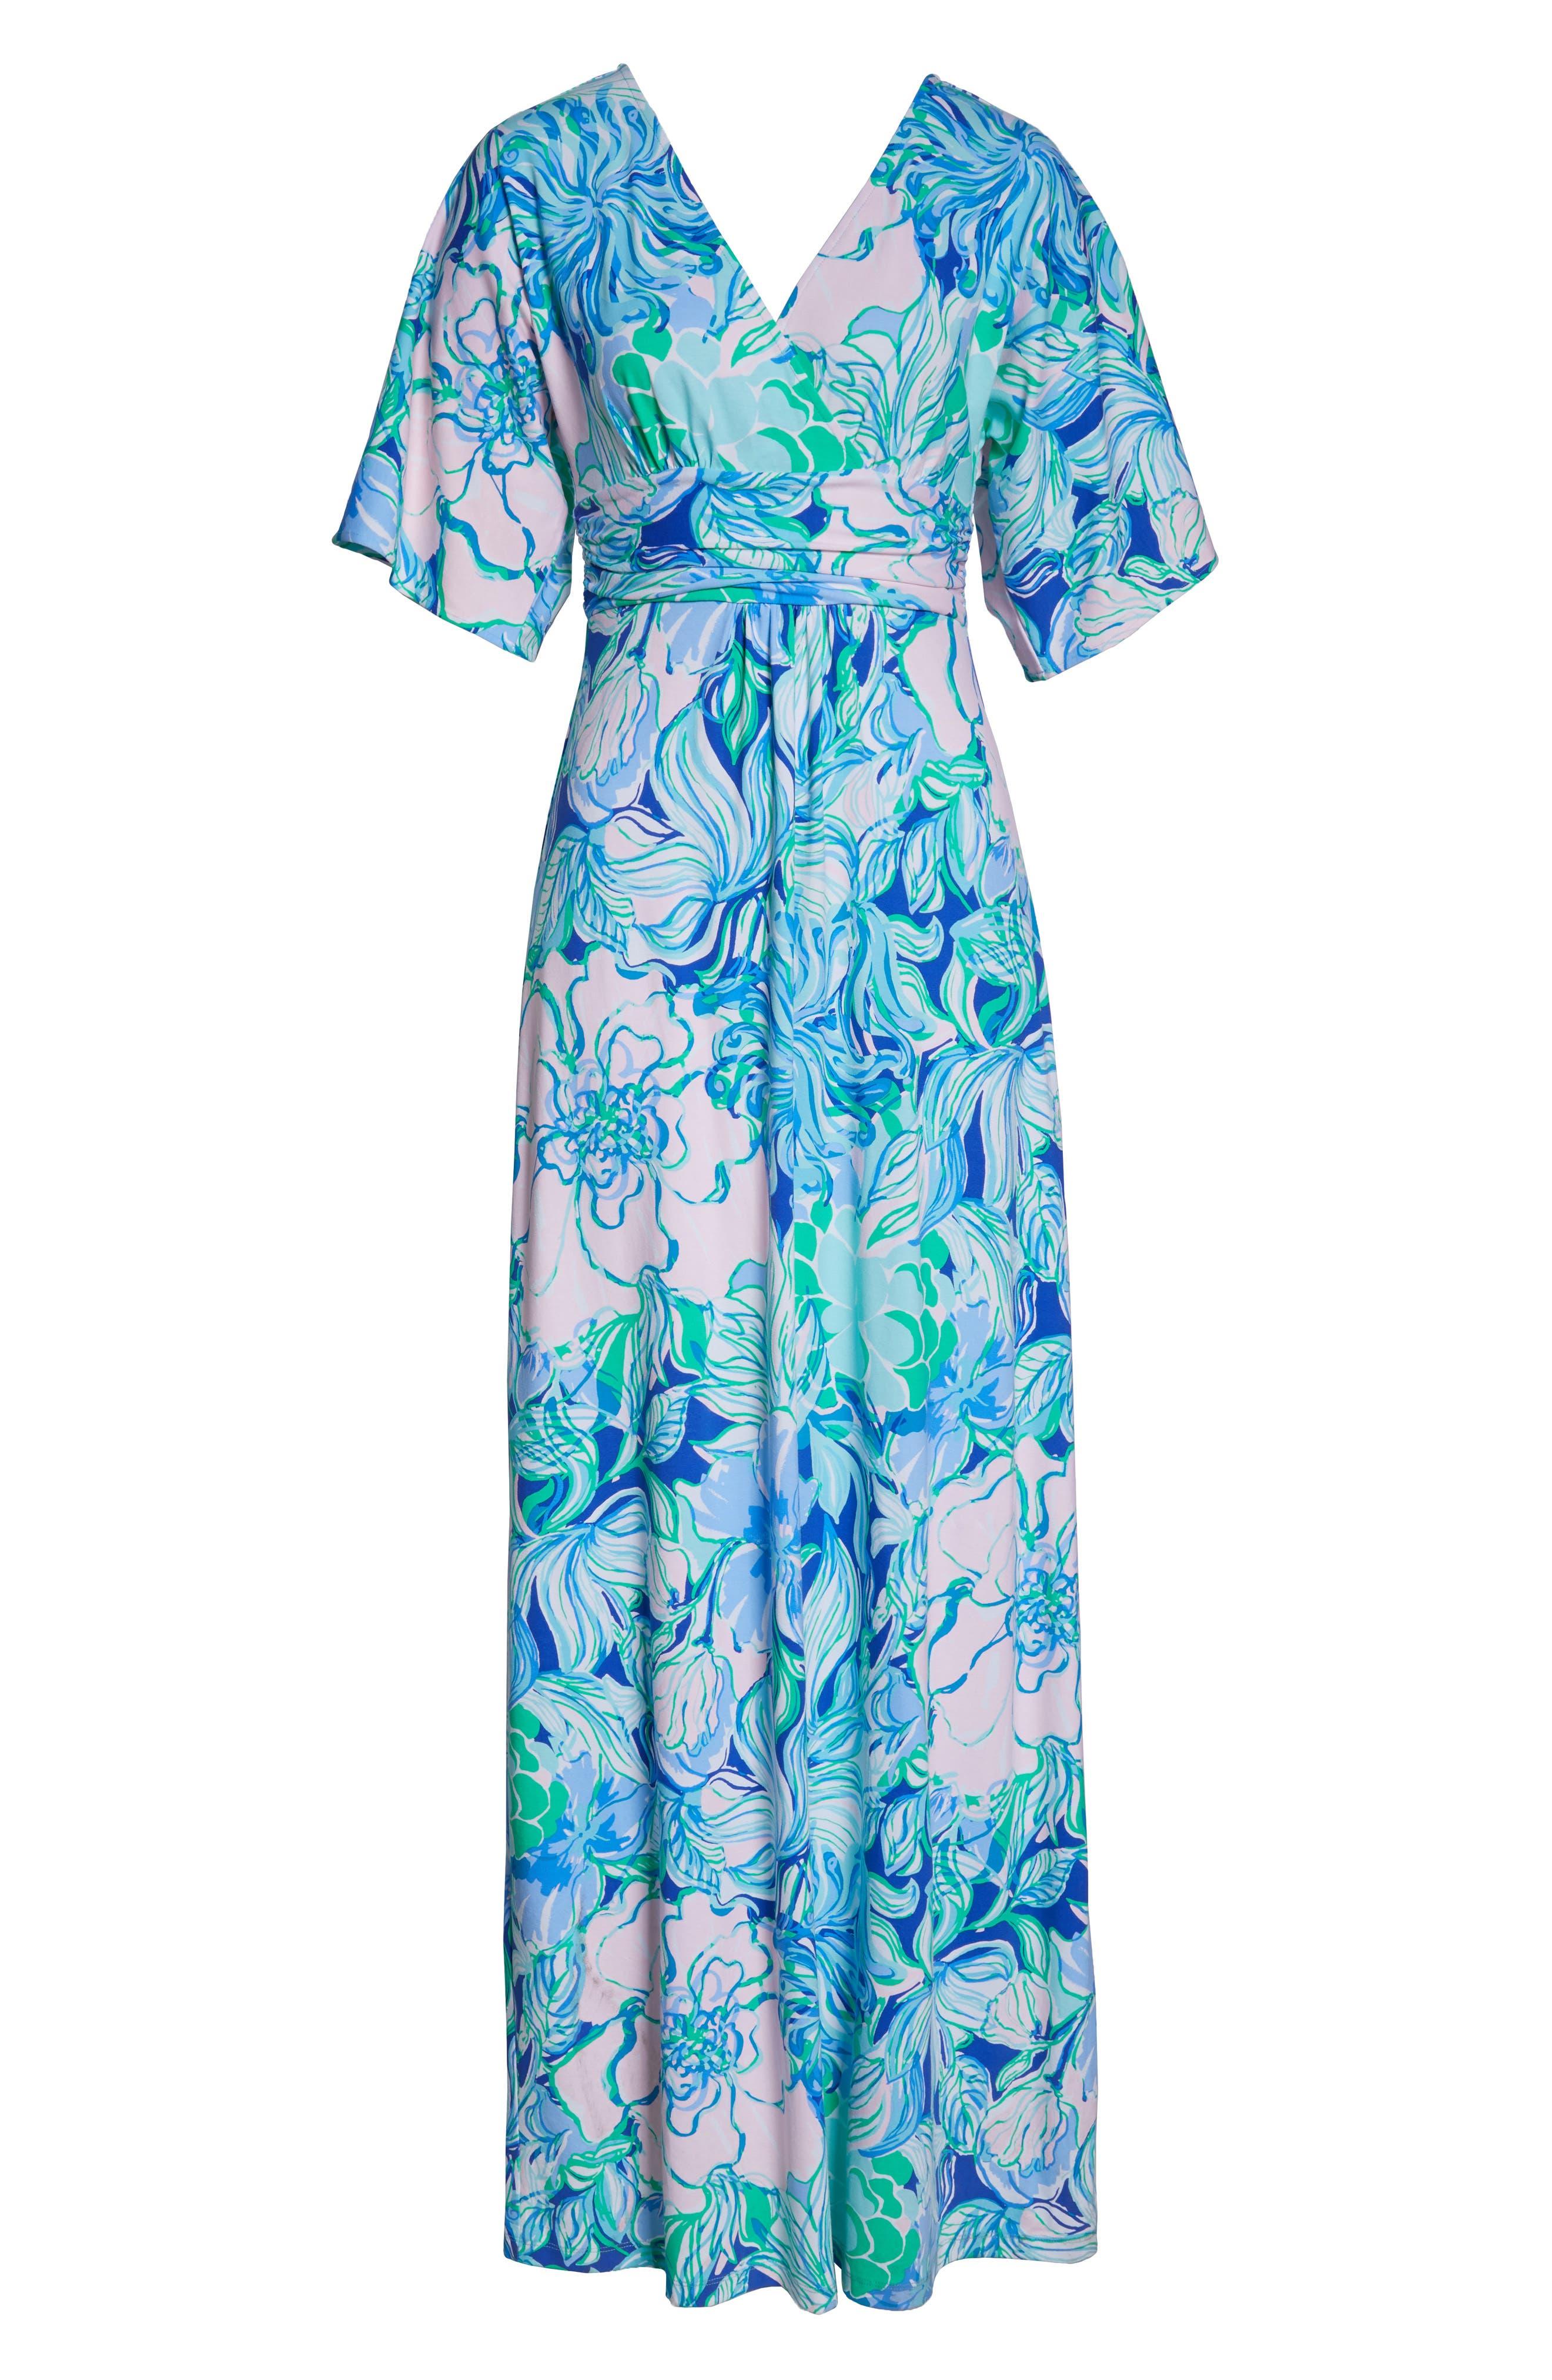 LILLY PULITZER<SUP>®</SUP>, Parigi Maxi Dress, Alternate thumbnail 6, color, MULTI PARTY THYME